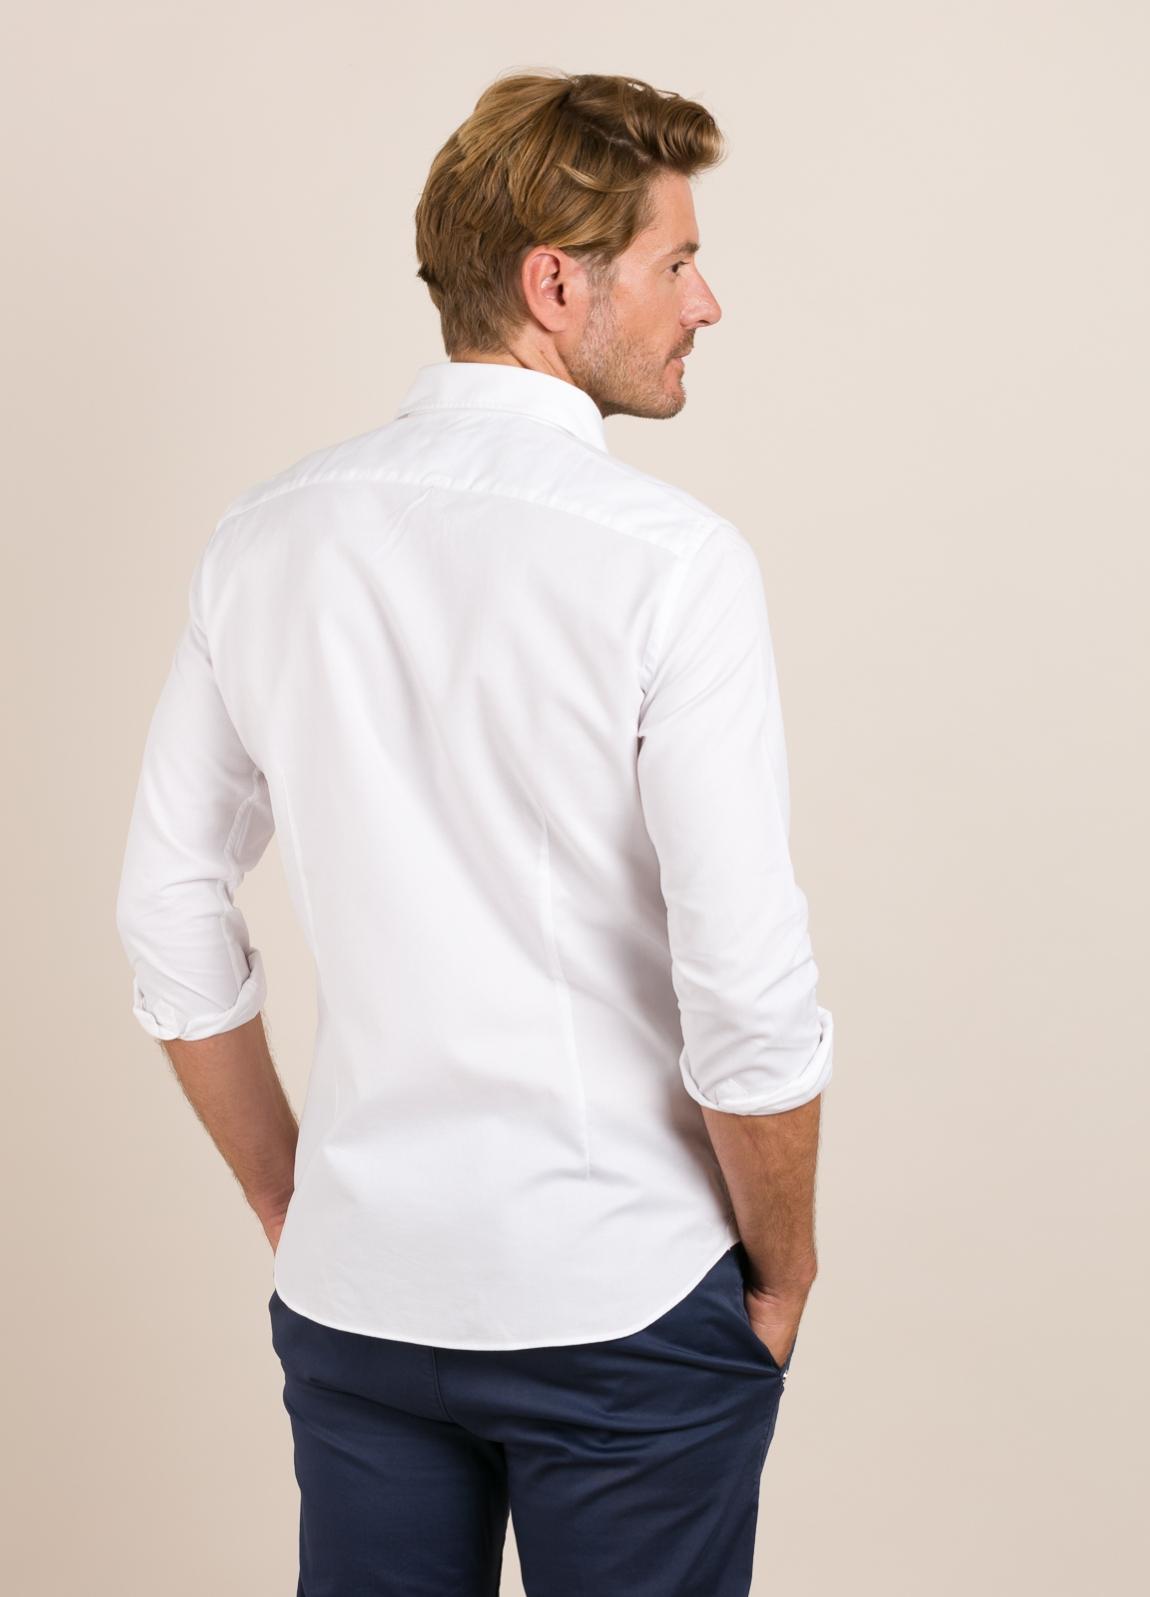 Camisa Casual Wear FUREST COLECCIÓN slim fit fil. - Ítem2